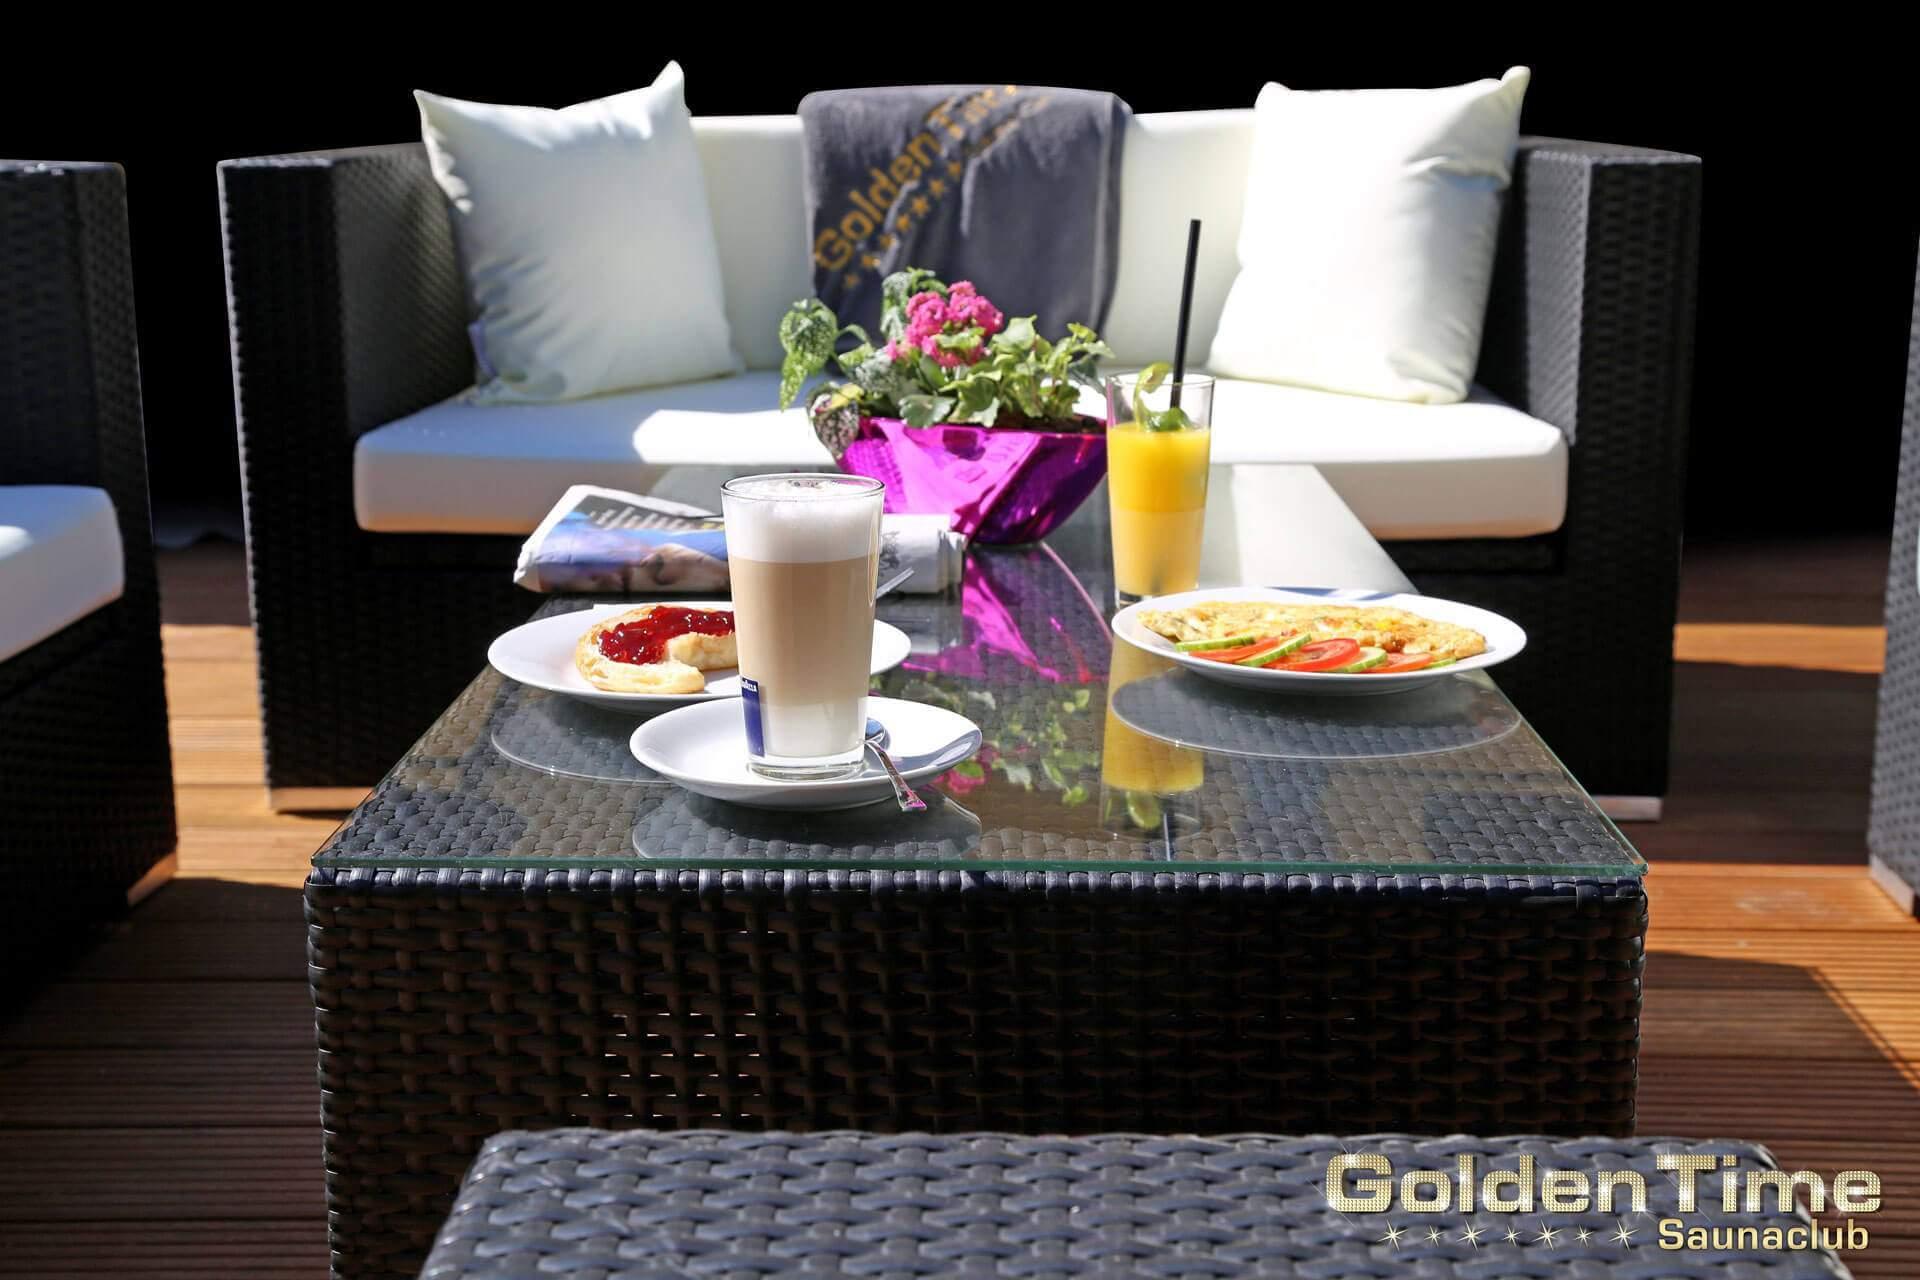 01-terrasse-pic-01-goldentime-saunaclub.jpg